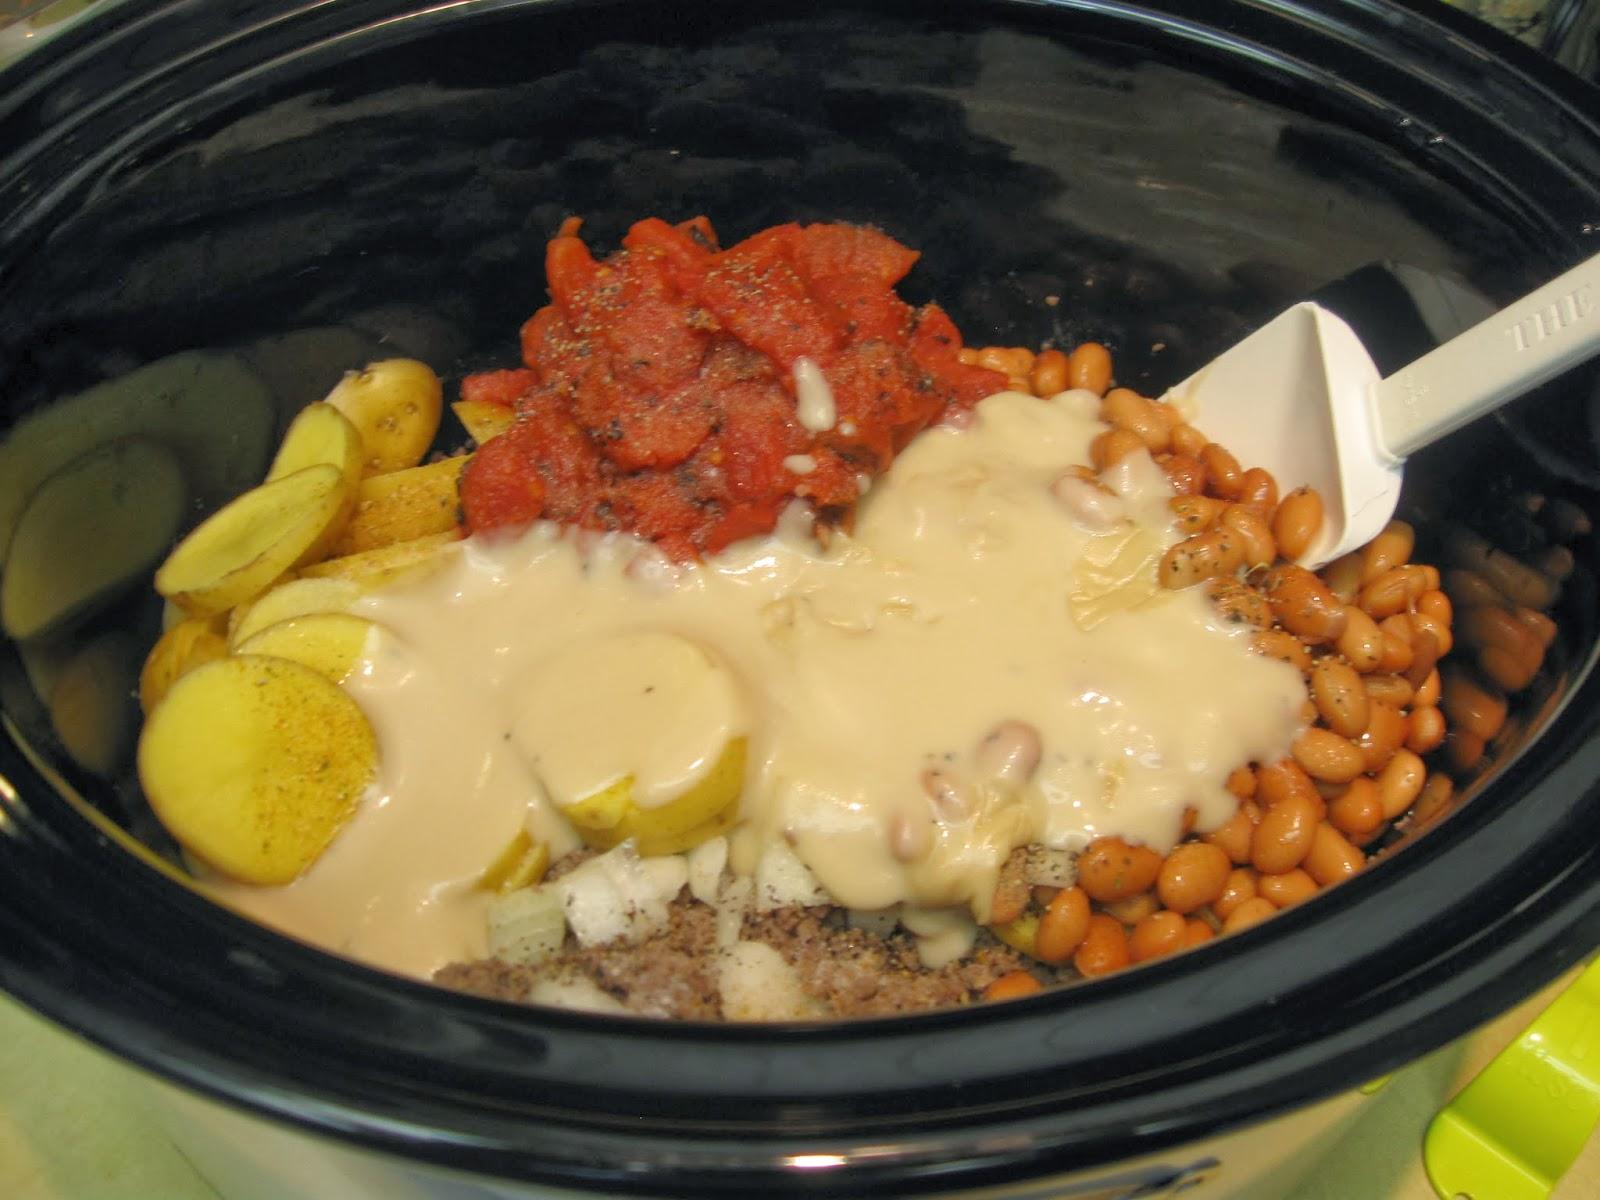 IMG_0297 taste and see god's goodness crockpot cheesy cowboy casserole